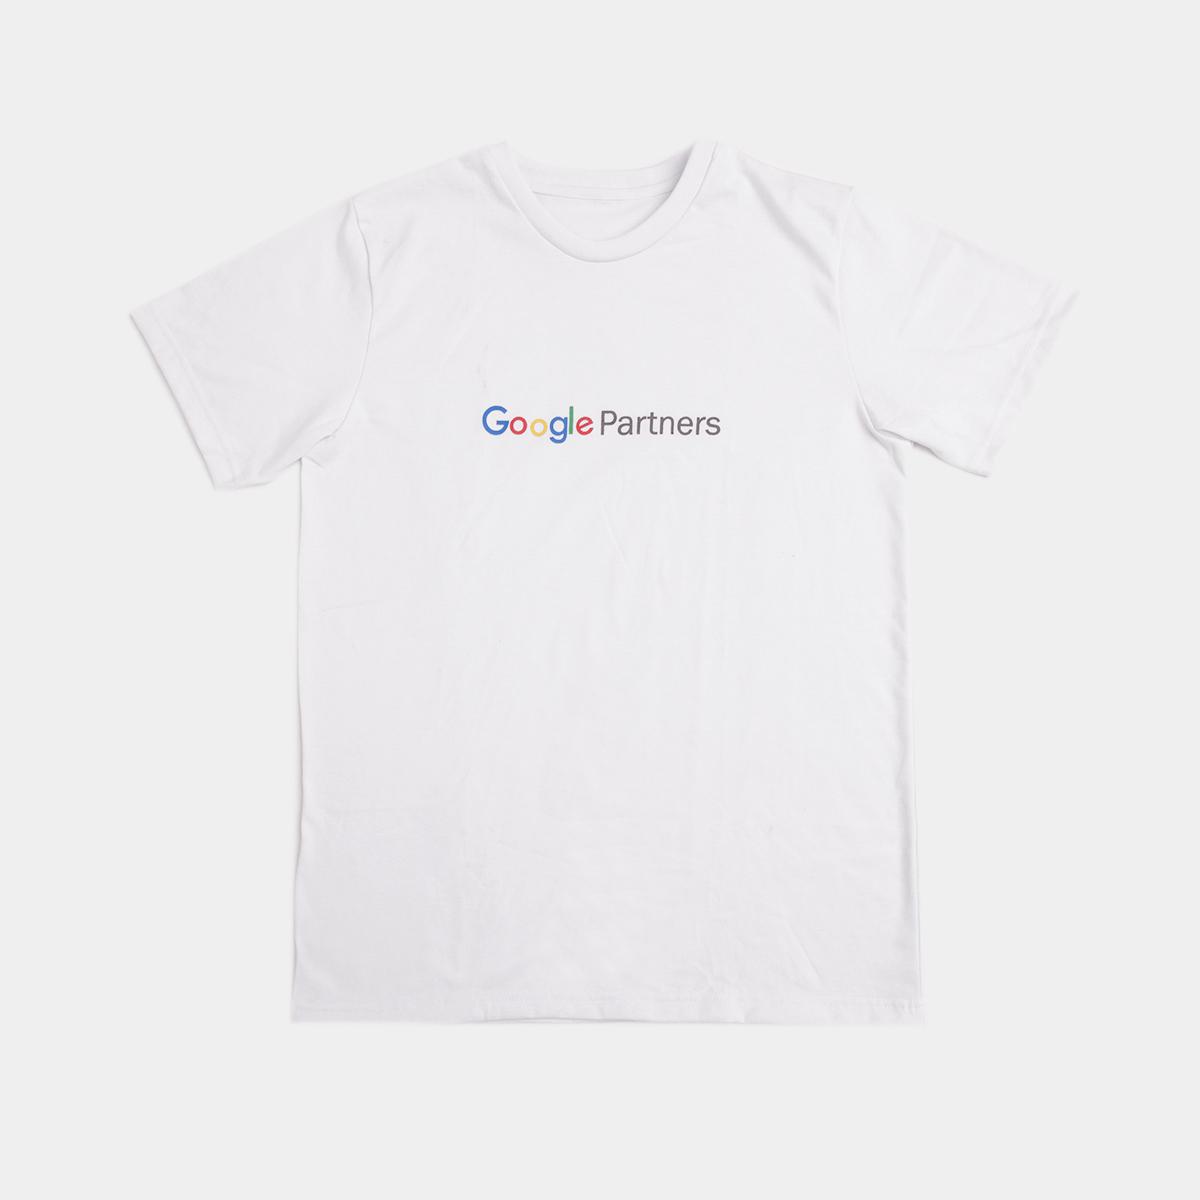 Tailored Projects- T-Shirt - Short Sleeve -Google- 1.jpg